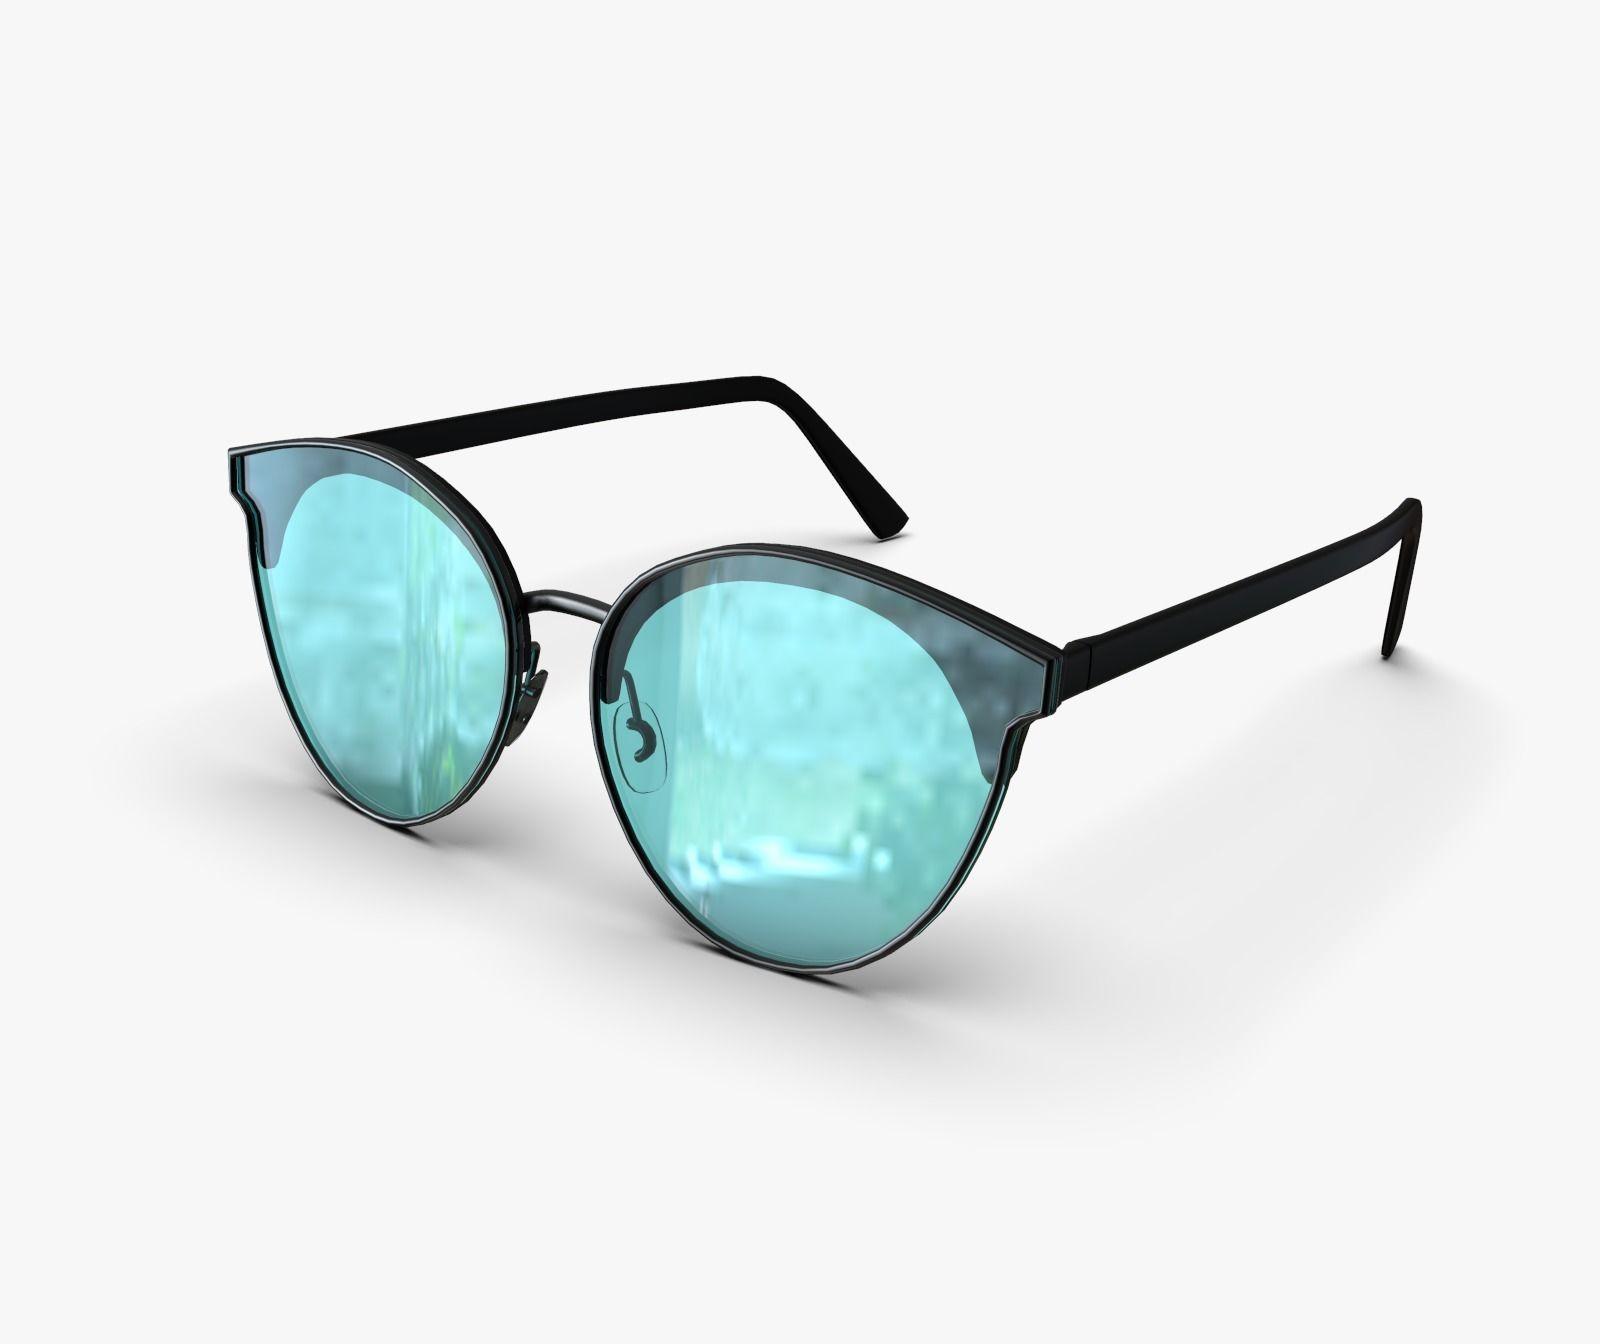 Eye glasses - Sunglasses